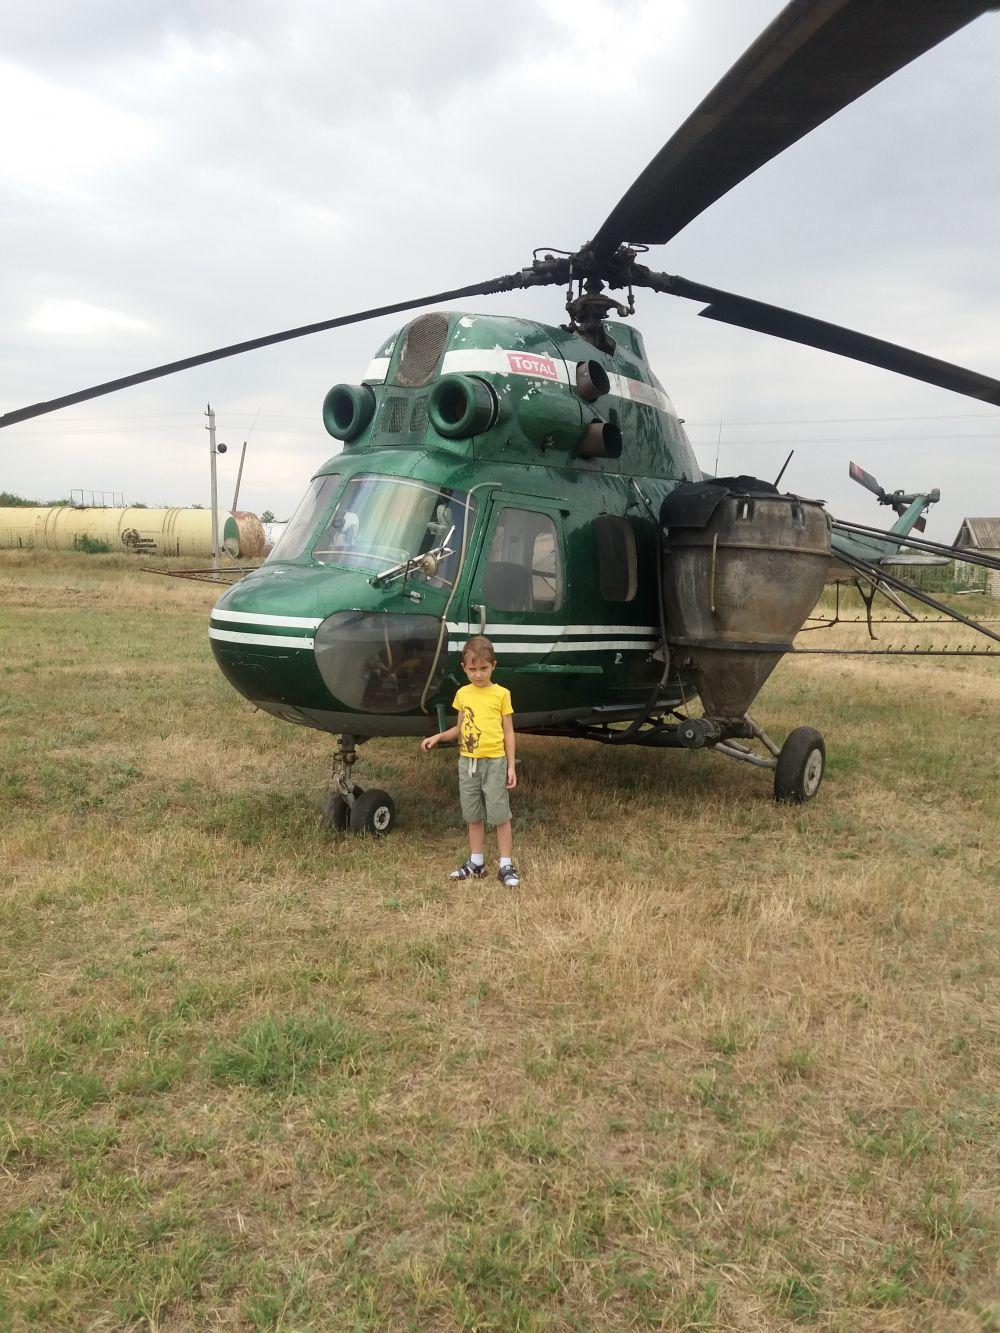 Глеб Агафоночкин, 6 лет, хутор Алтухов, Ставропольский край